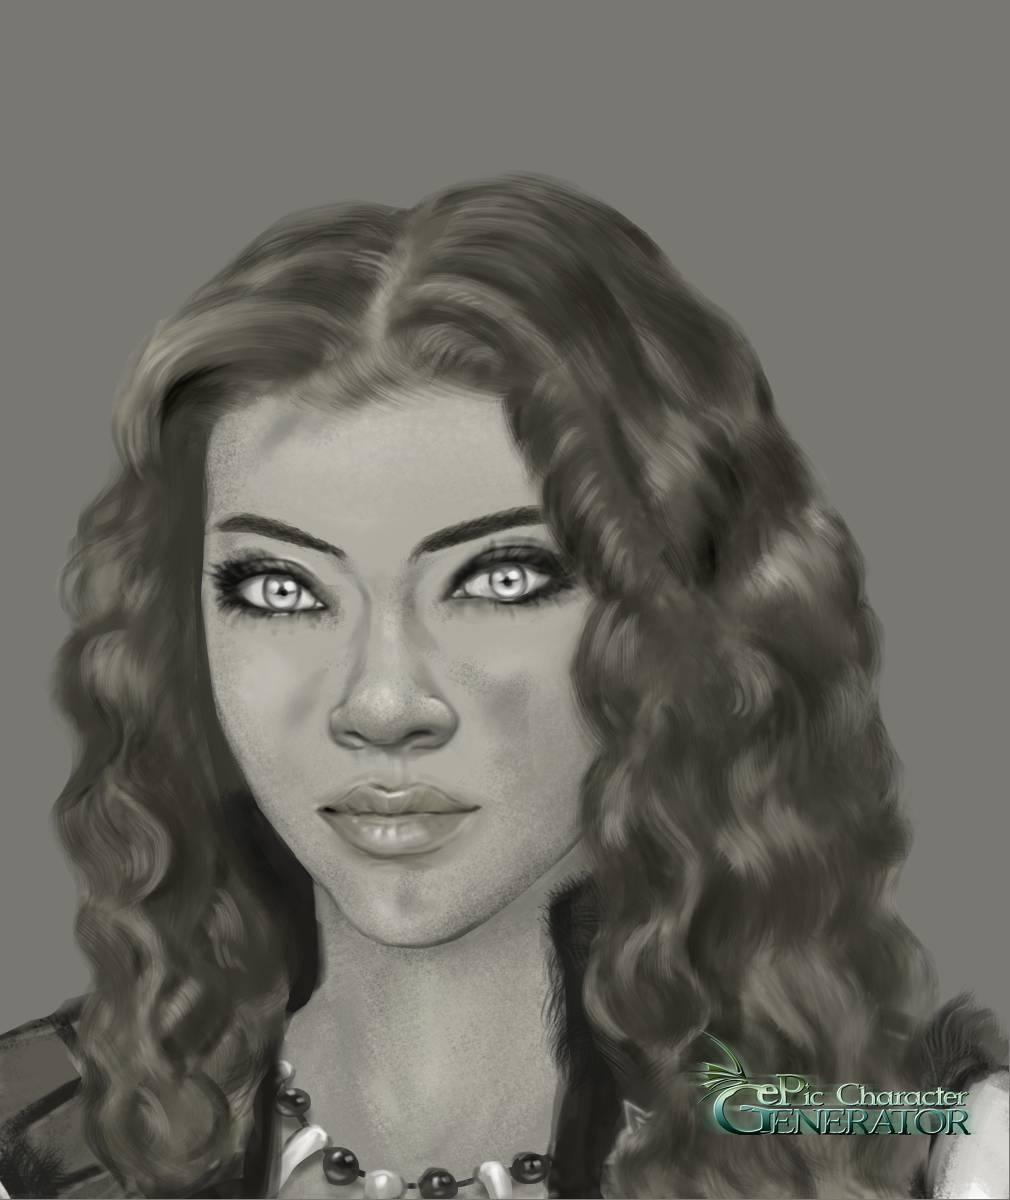 ePic Character Generator Season 3 Female Portrait Screenshot 11